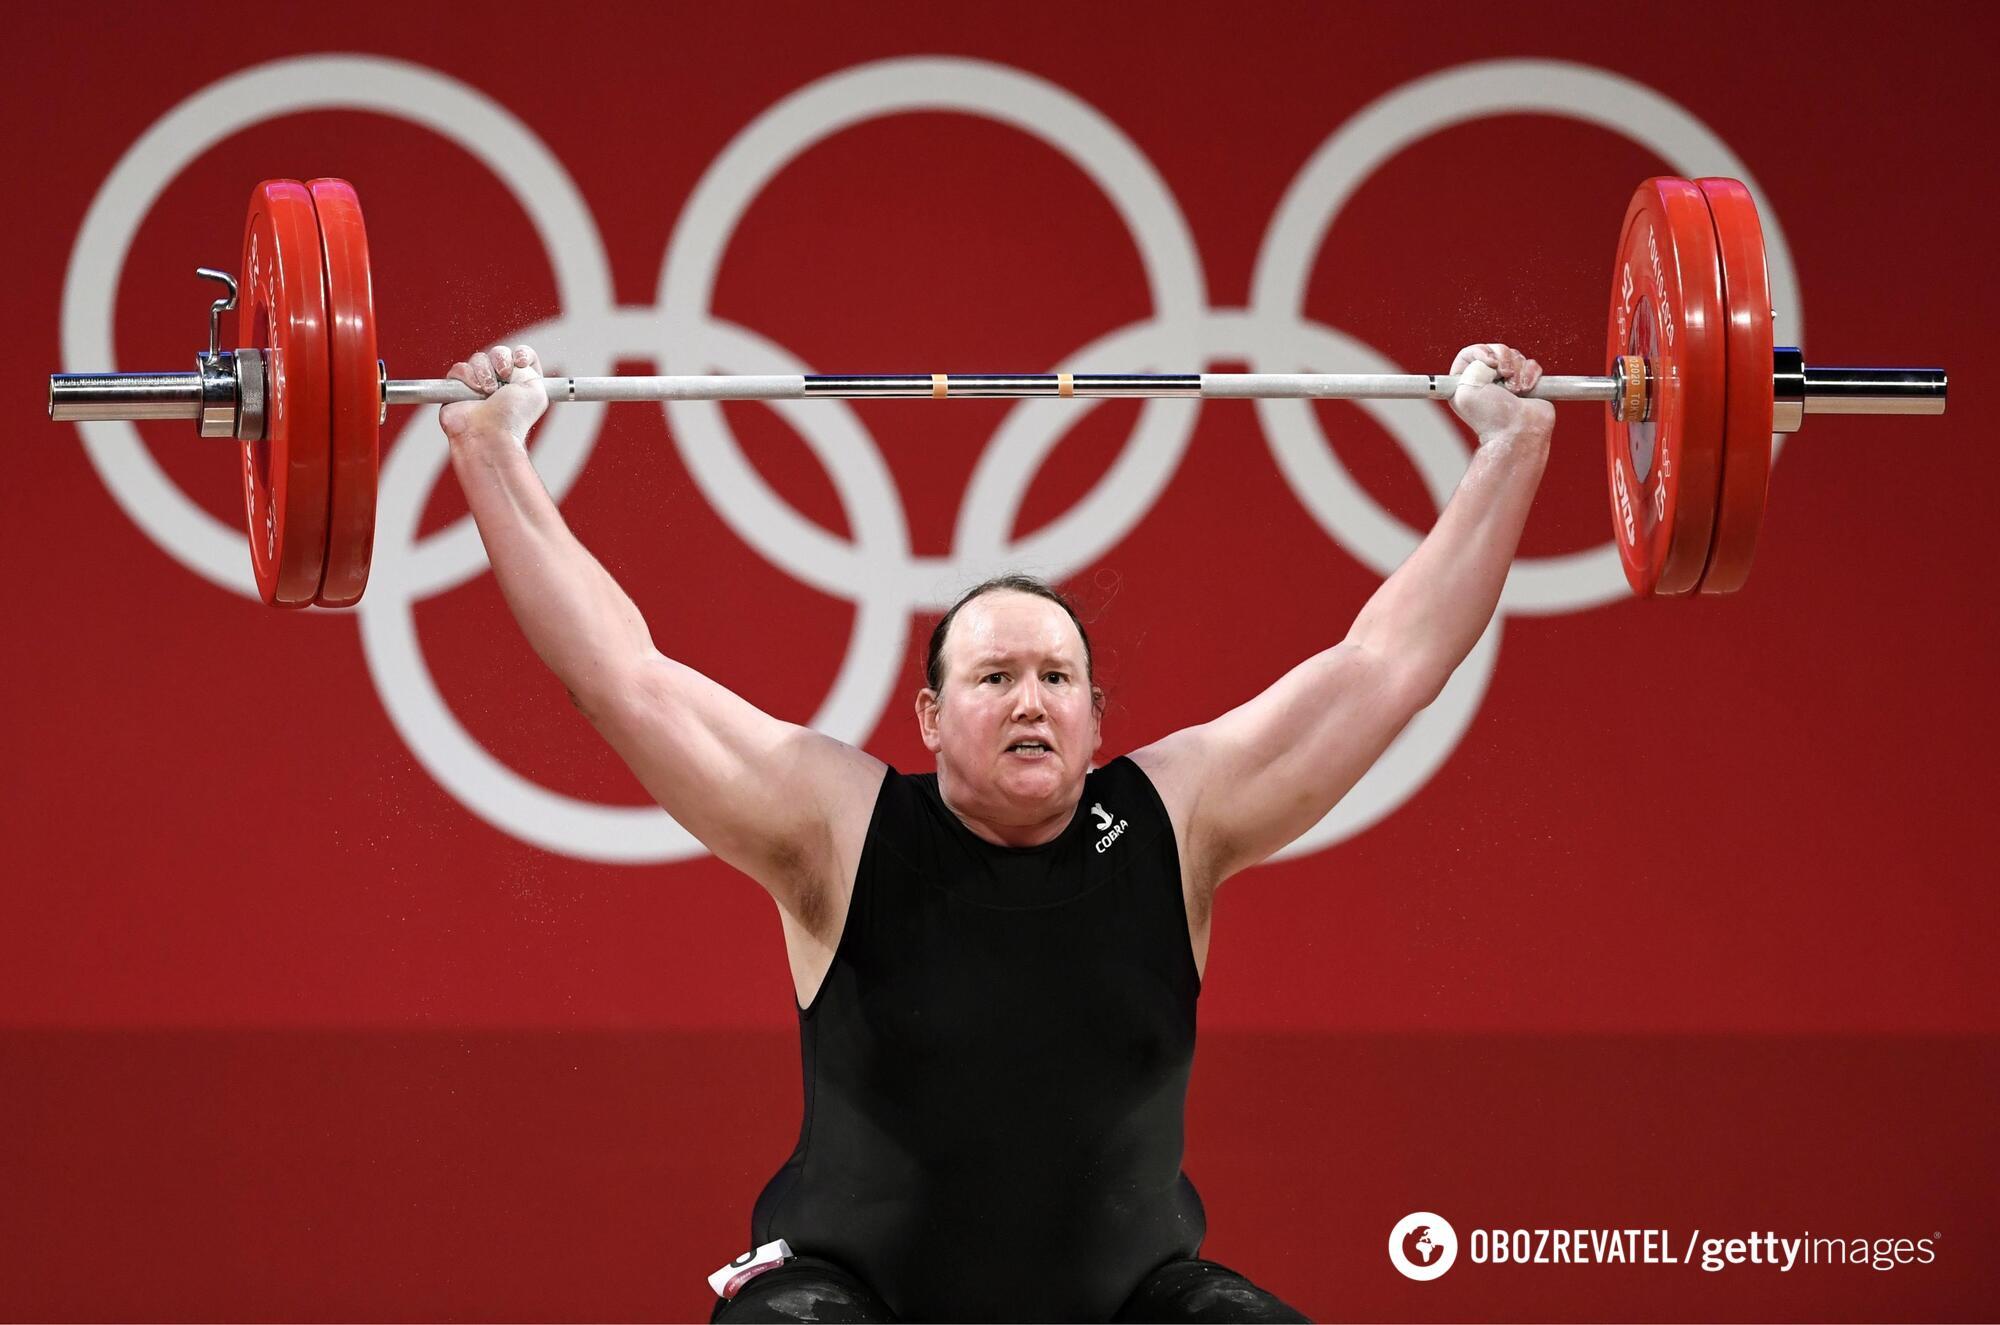 Хаббард не змогла взяти медаль